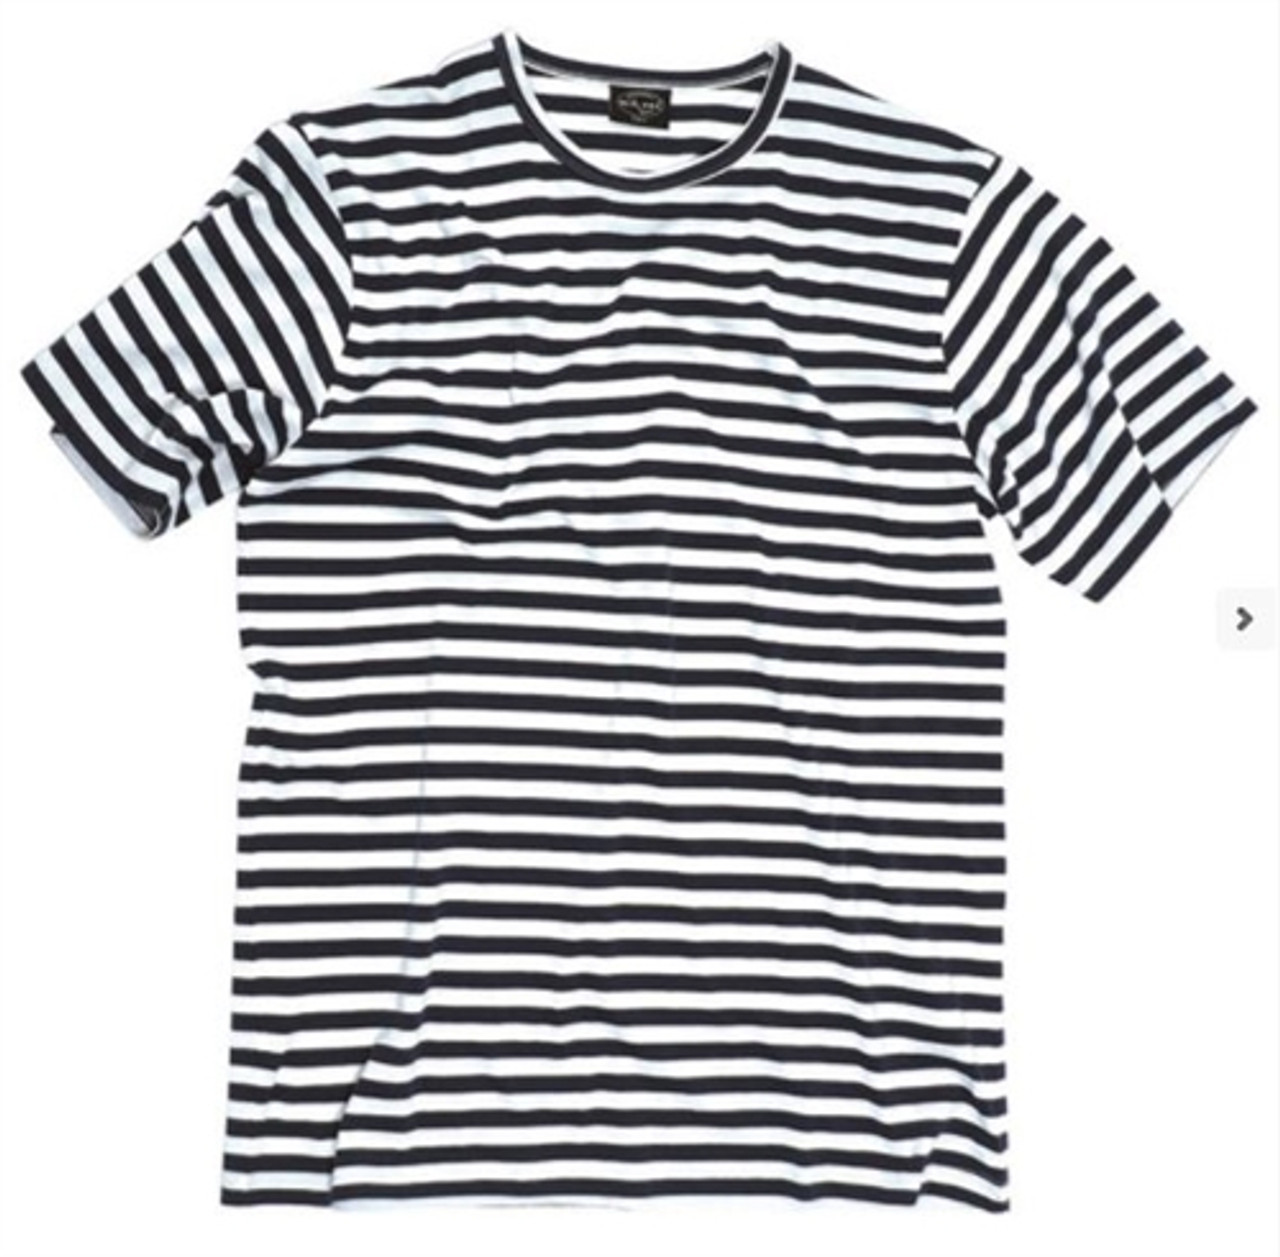 Russian Striped T-Shirt from Hessen Antique